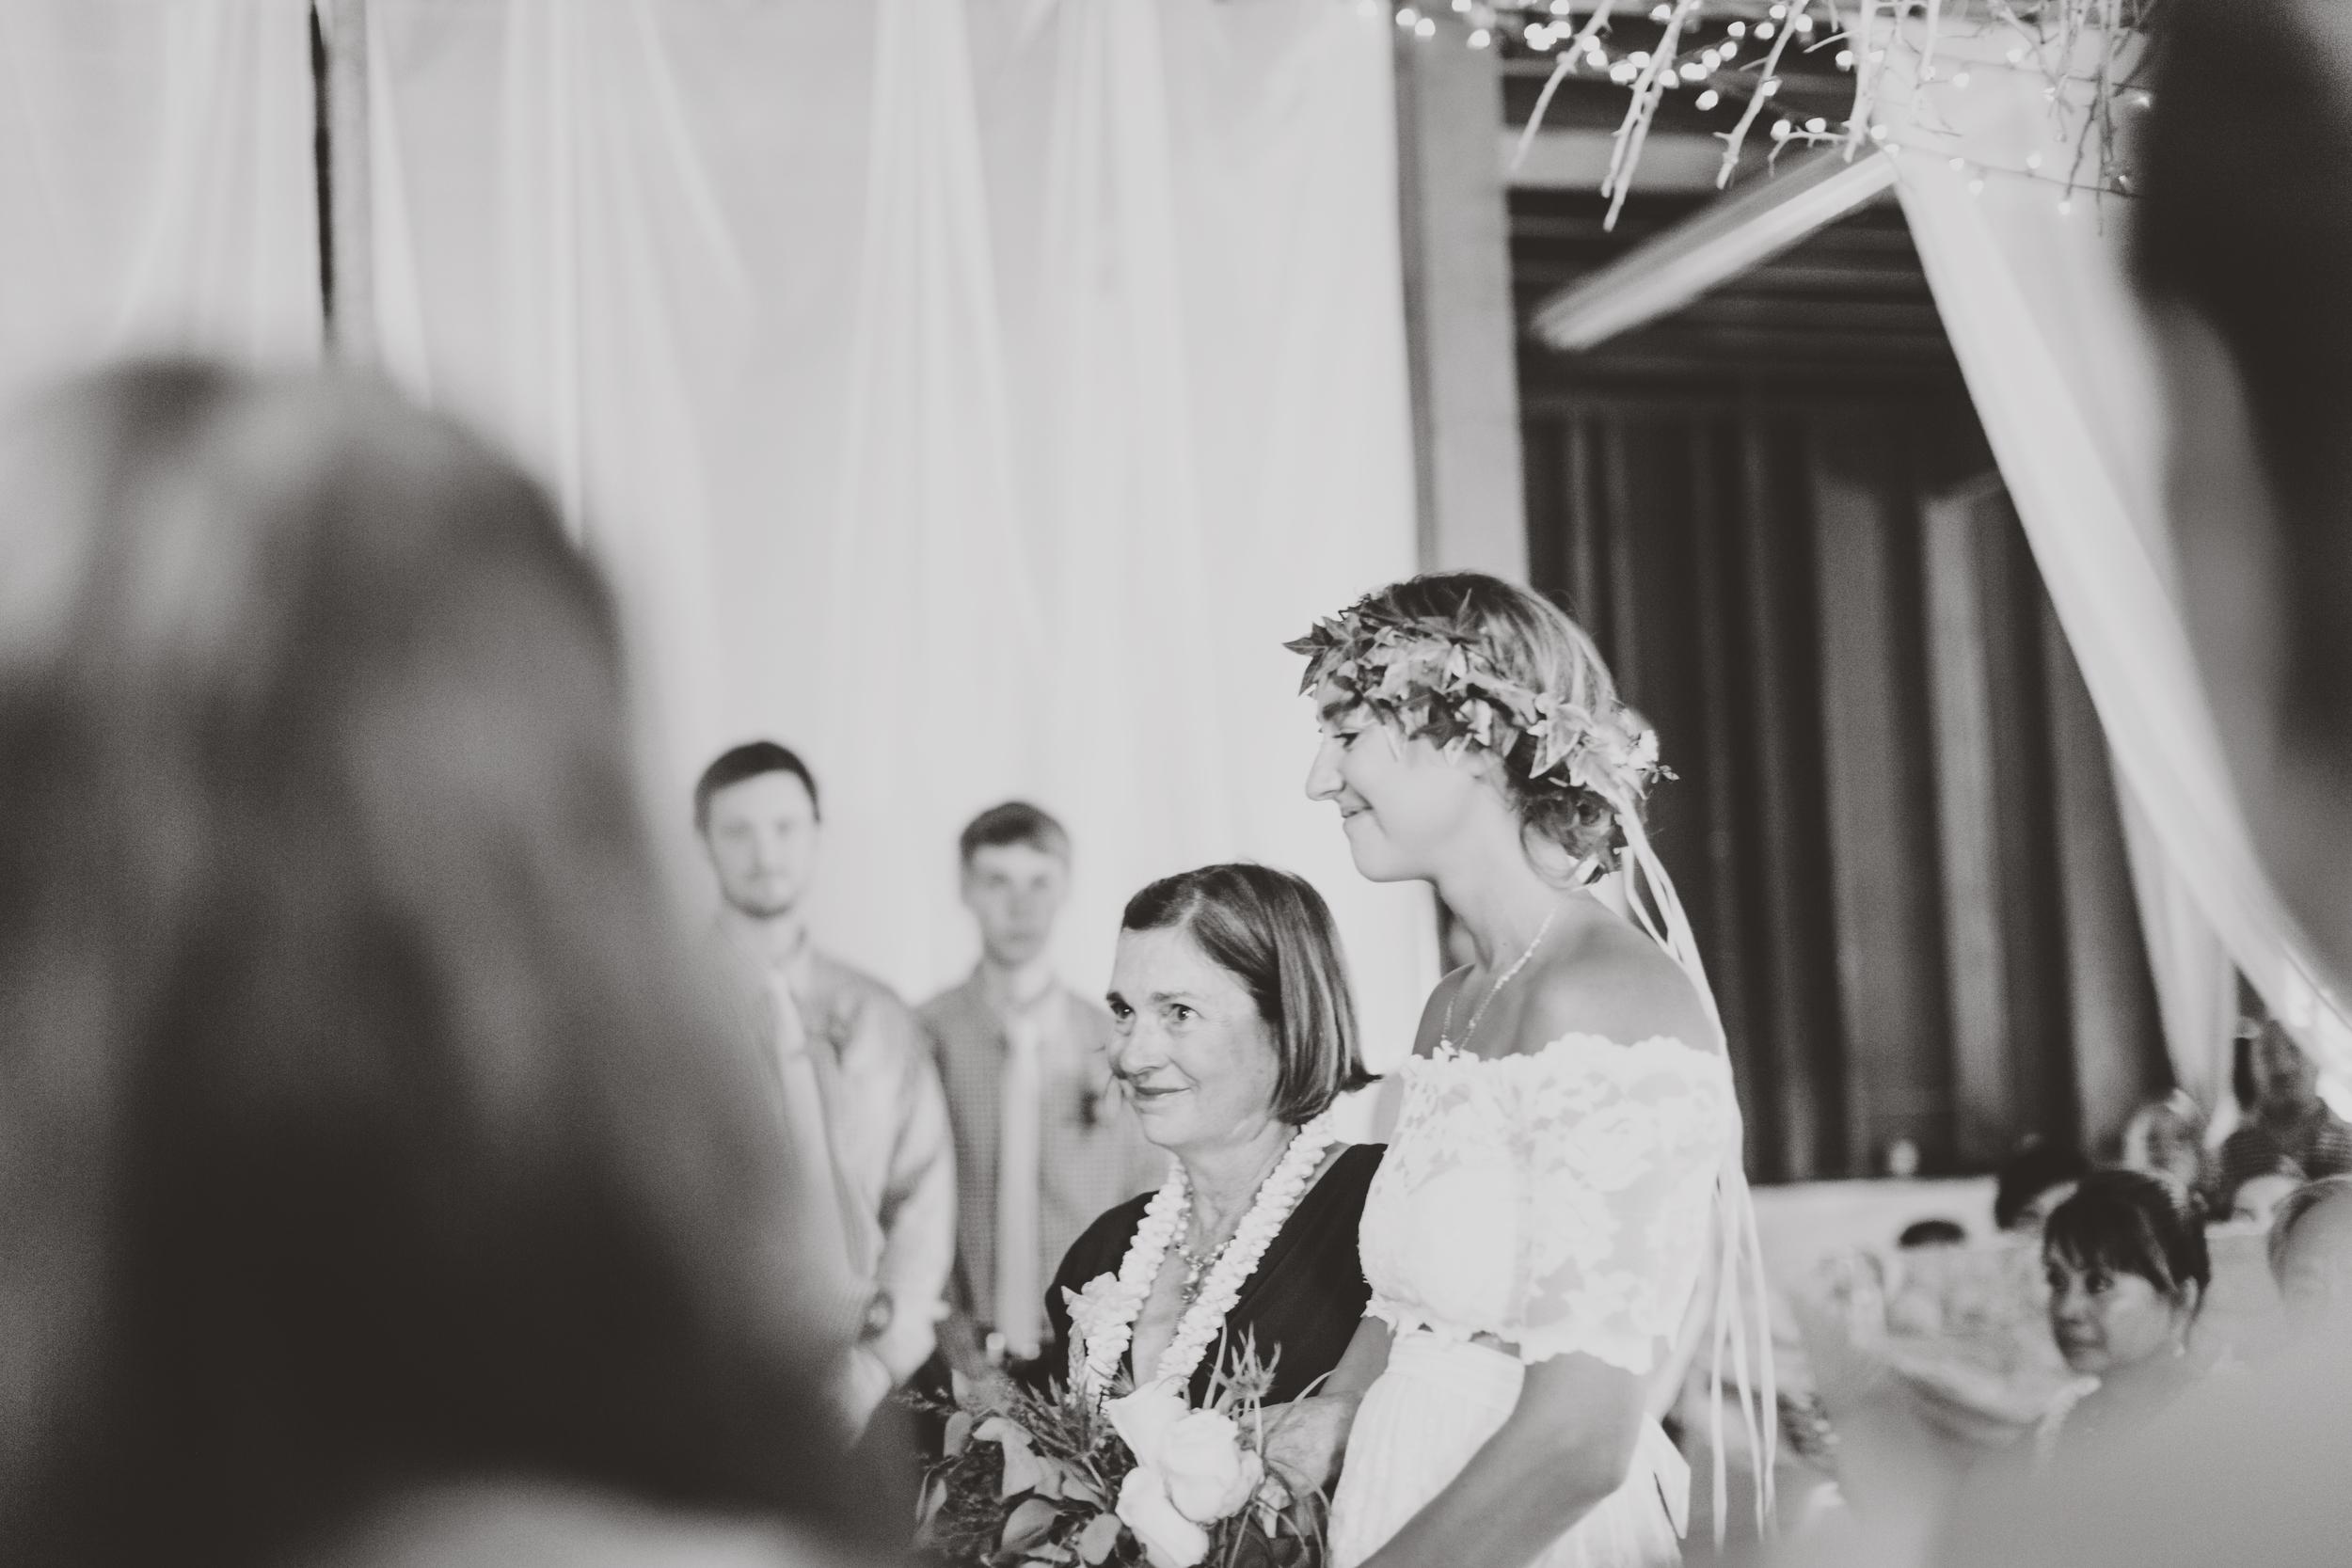 angie-diaz-photography-oahu-hawaii-wedding-tradewinds-ranch-53.jpg